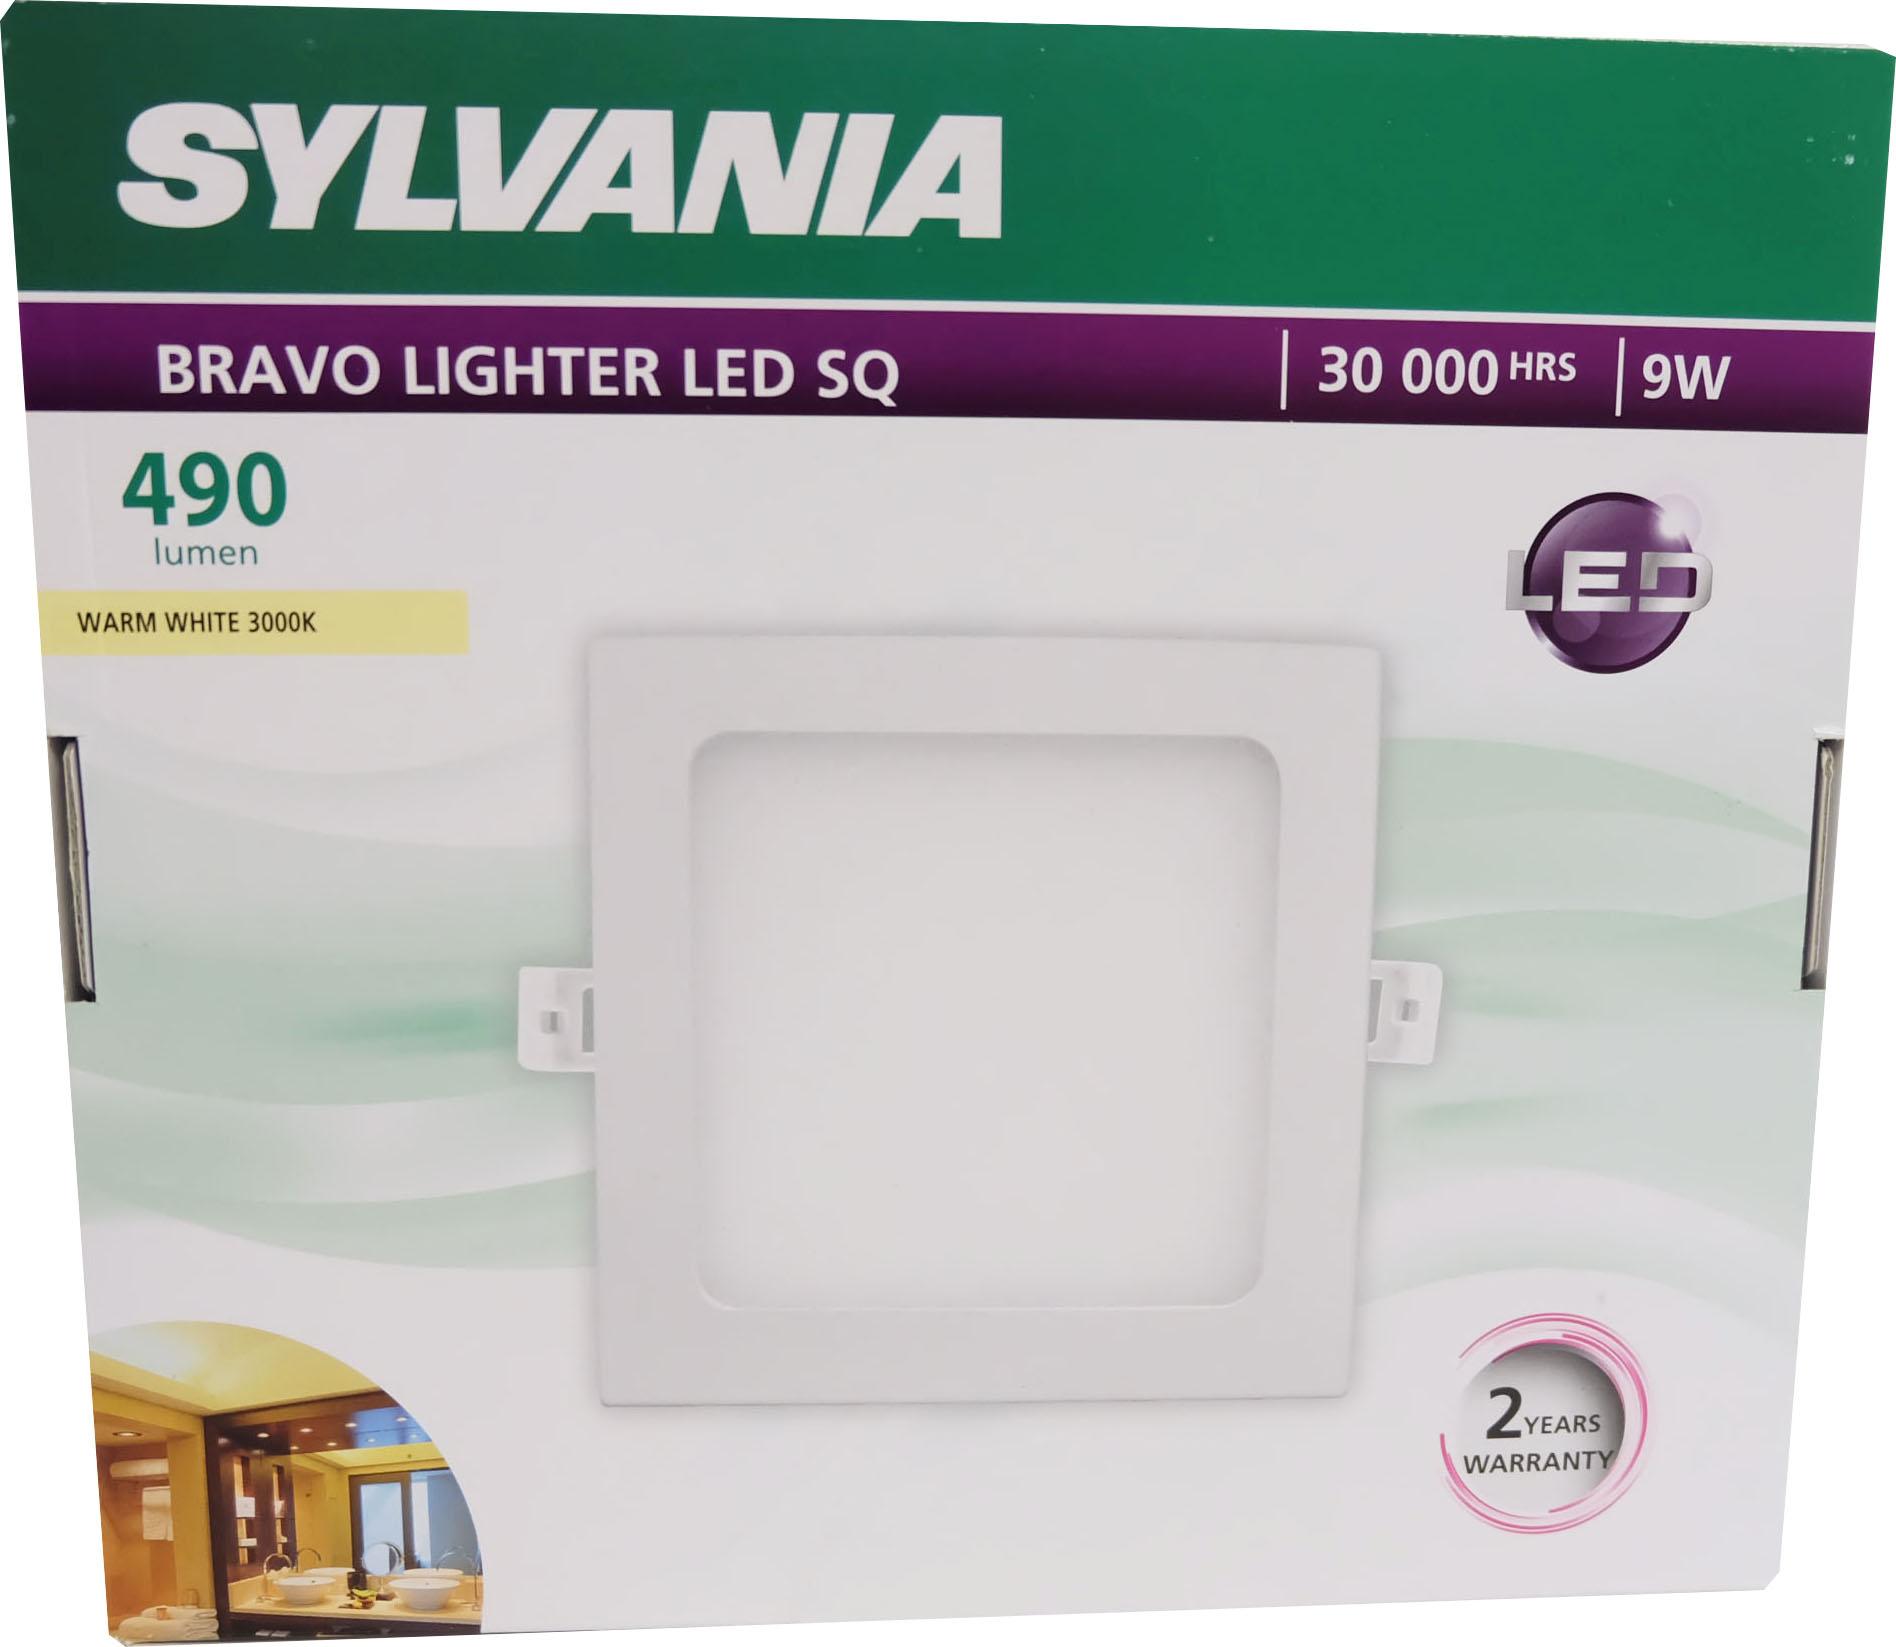 SYLVANIA  ดาวน์ไลท์ BRAVO LIGHTER LED SQ   _9 วัตต์ (แสงวอร์มไวท์)